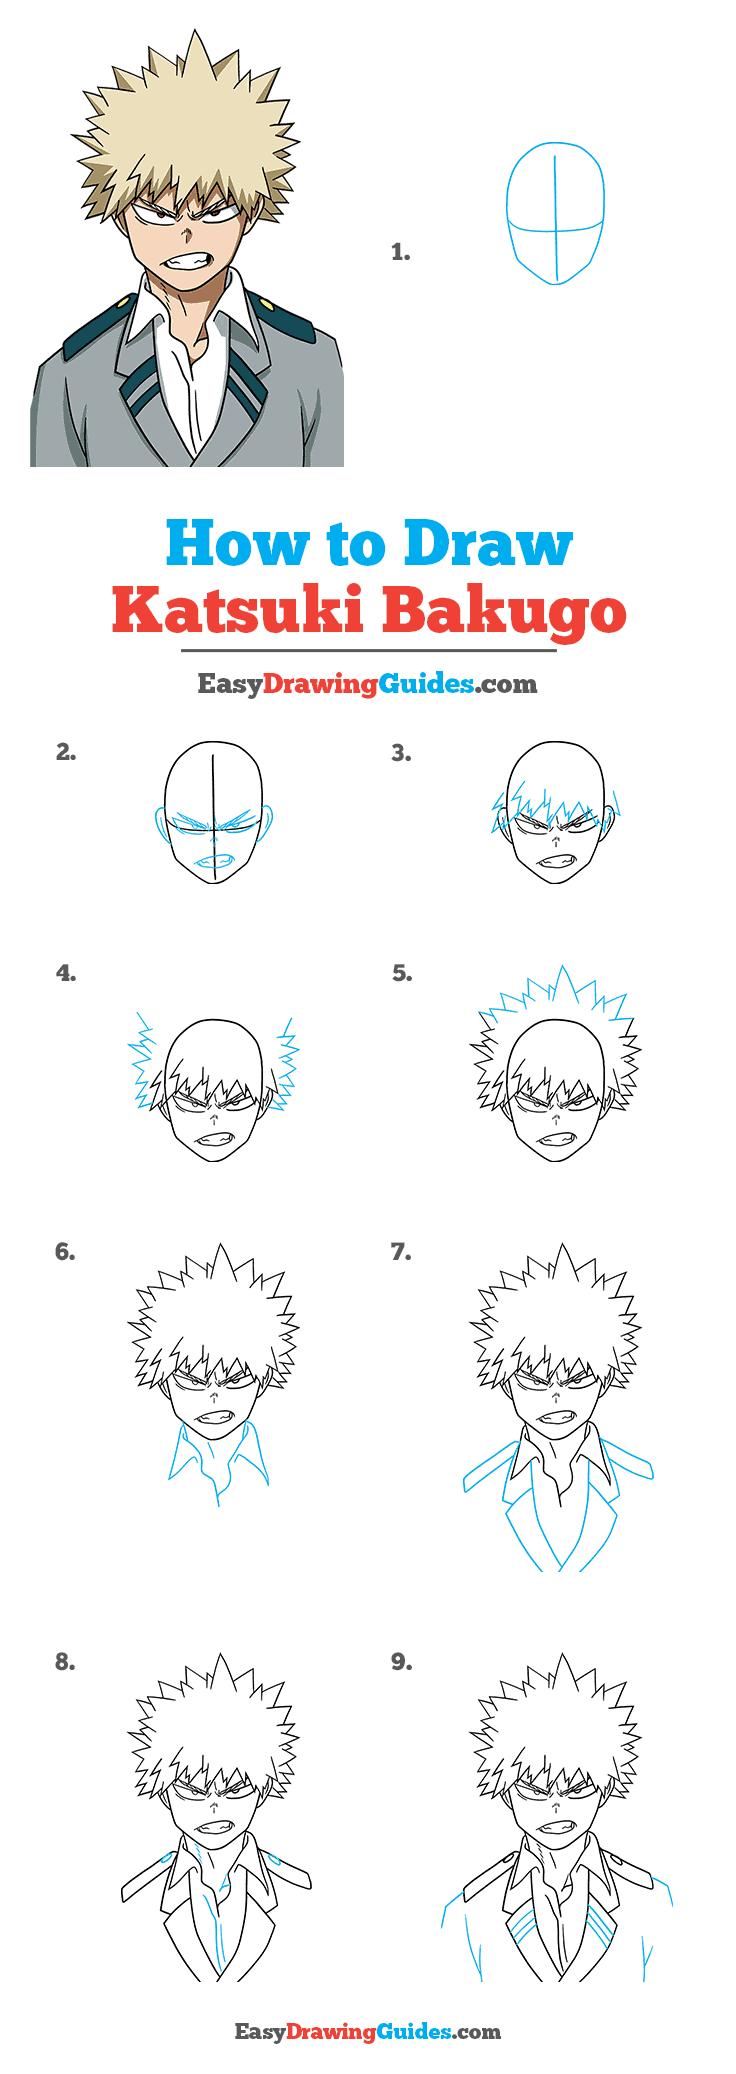 How to Draw Katsuki Bakugo from My Hero Academia Step by Step Tutorial Image